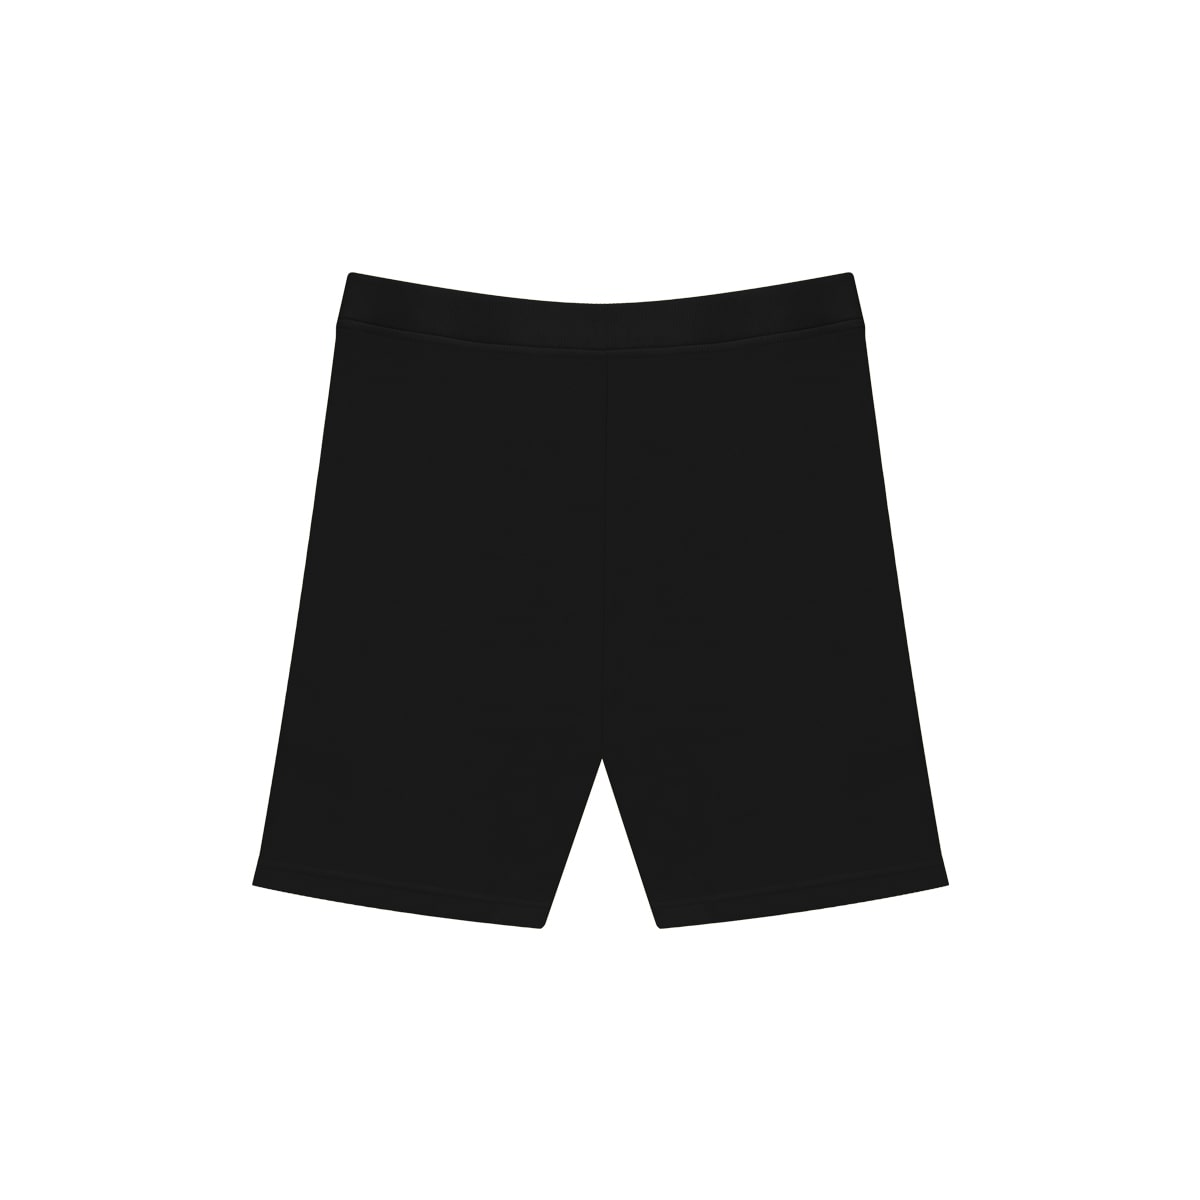 Black Bike Short UPDF